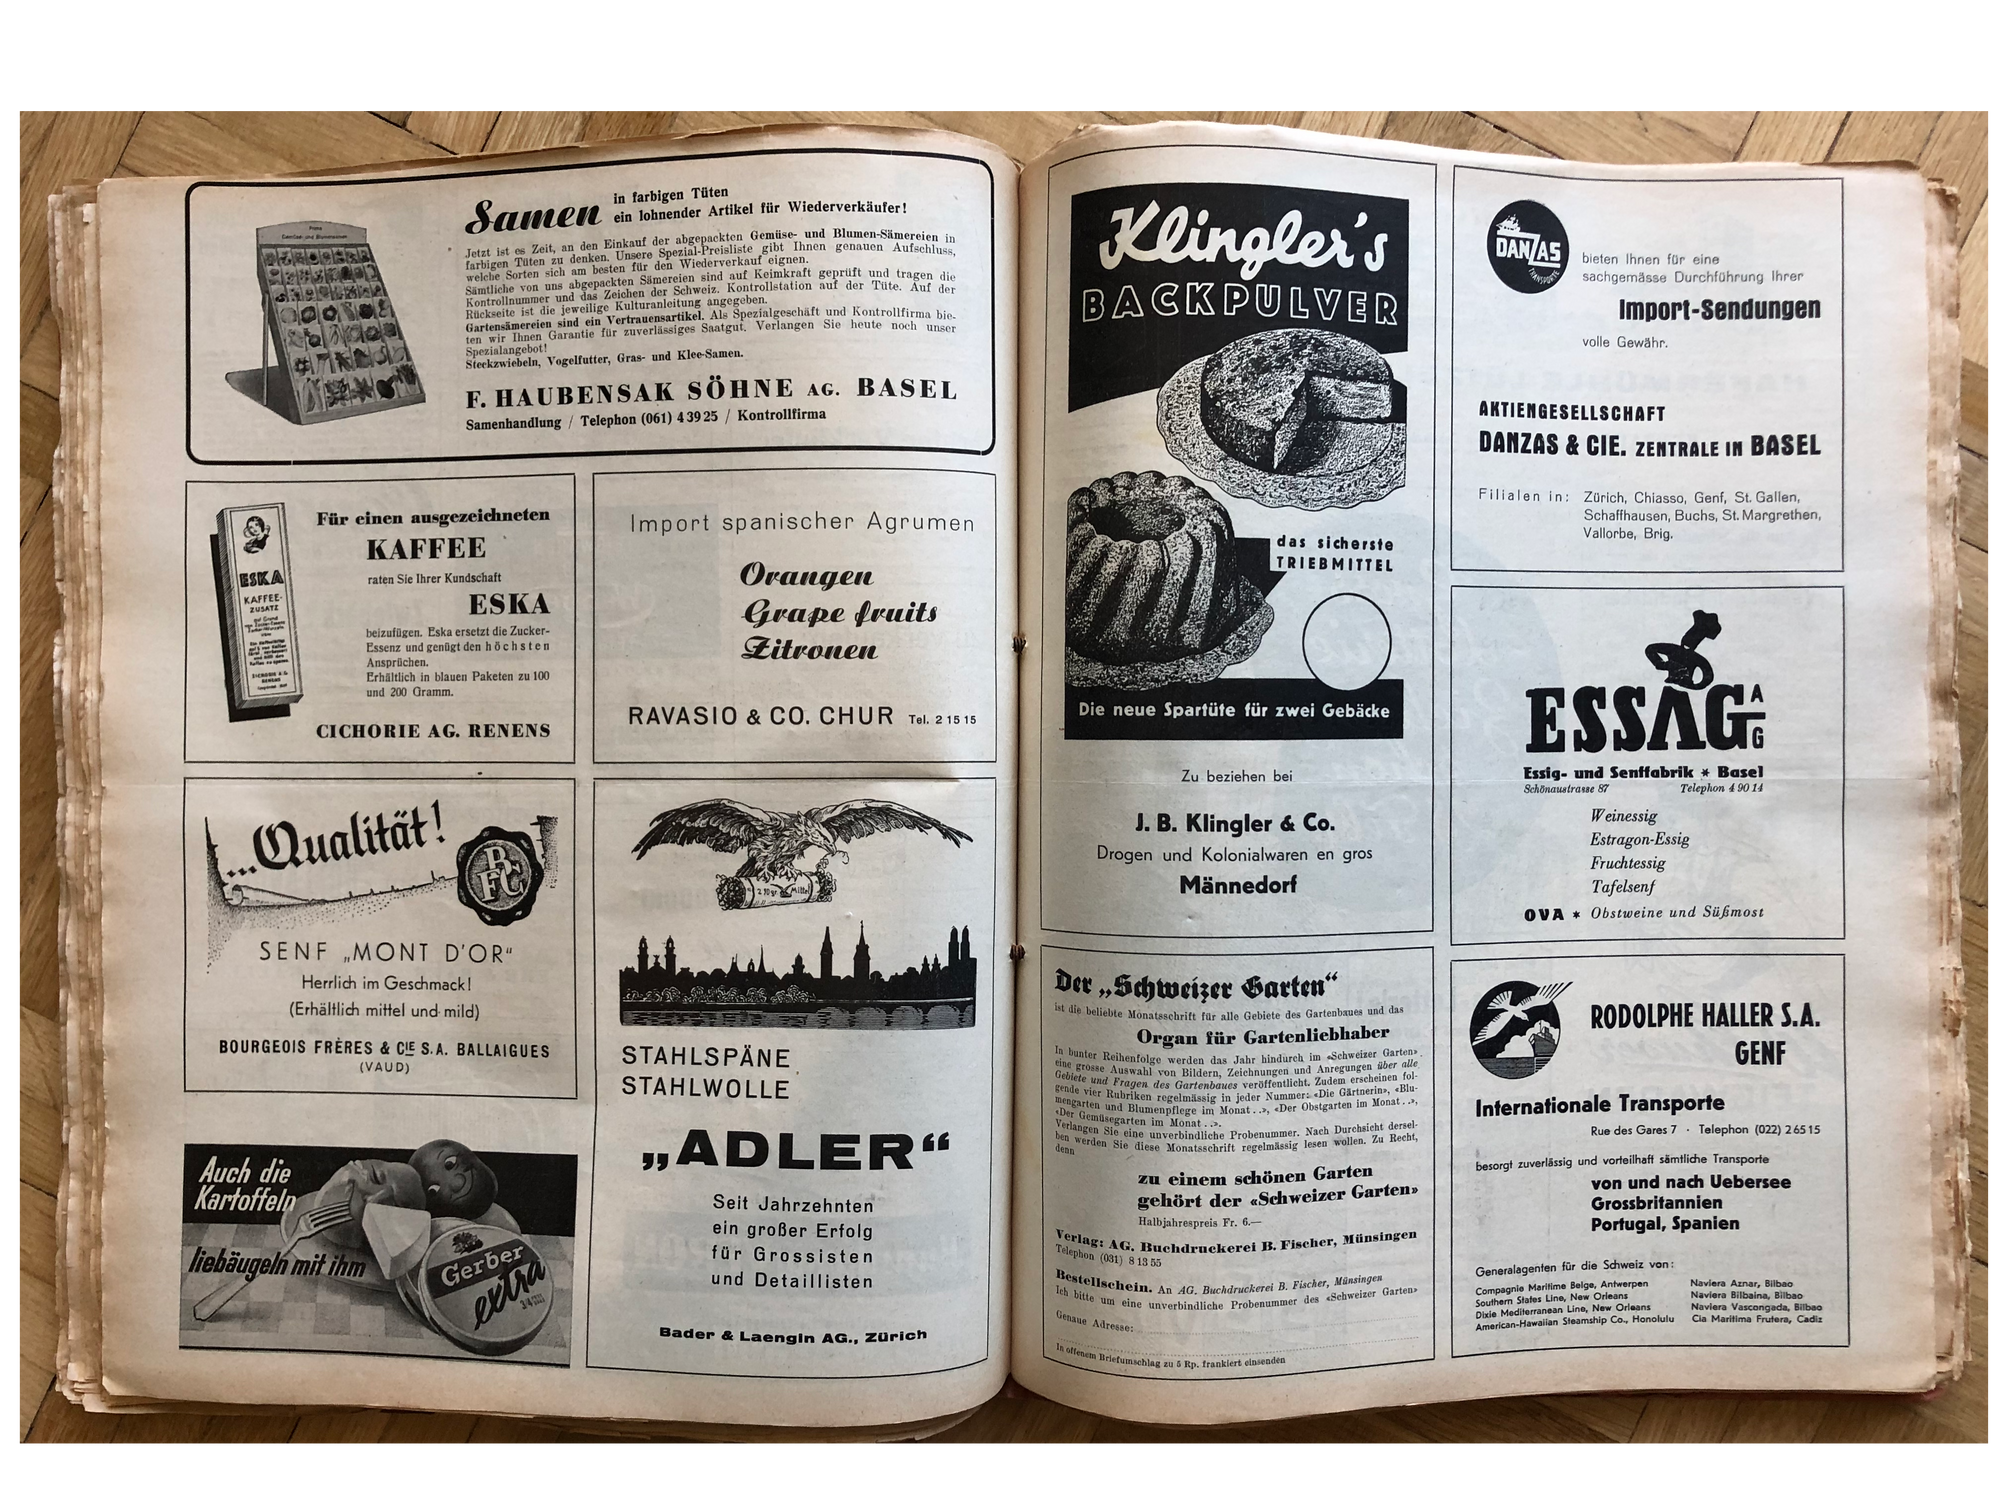 swipe file from Switzerland, ca. 1940